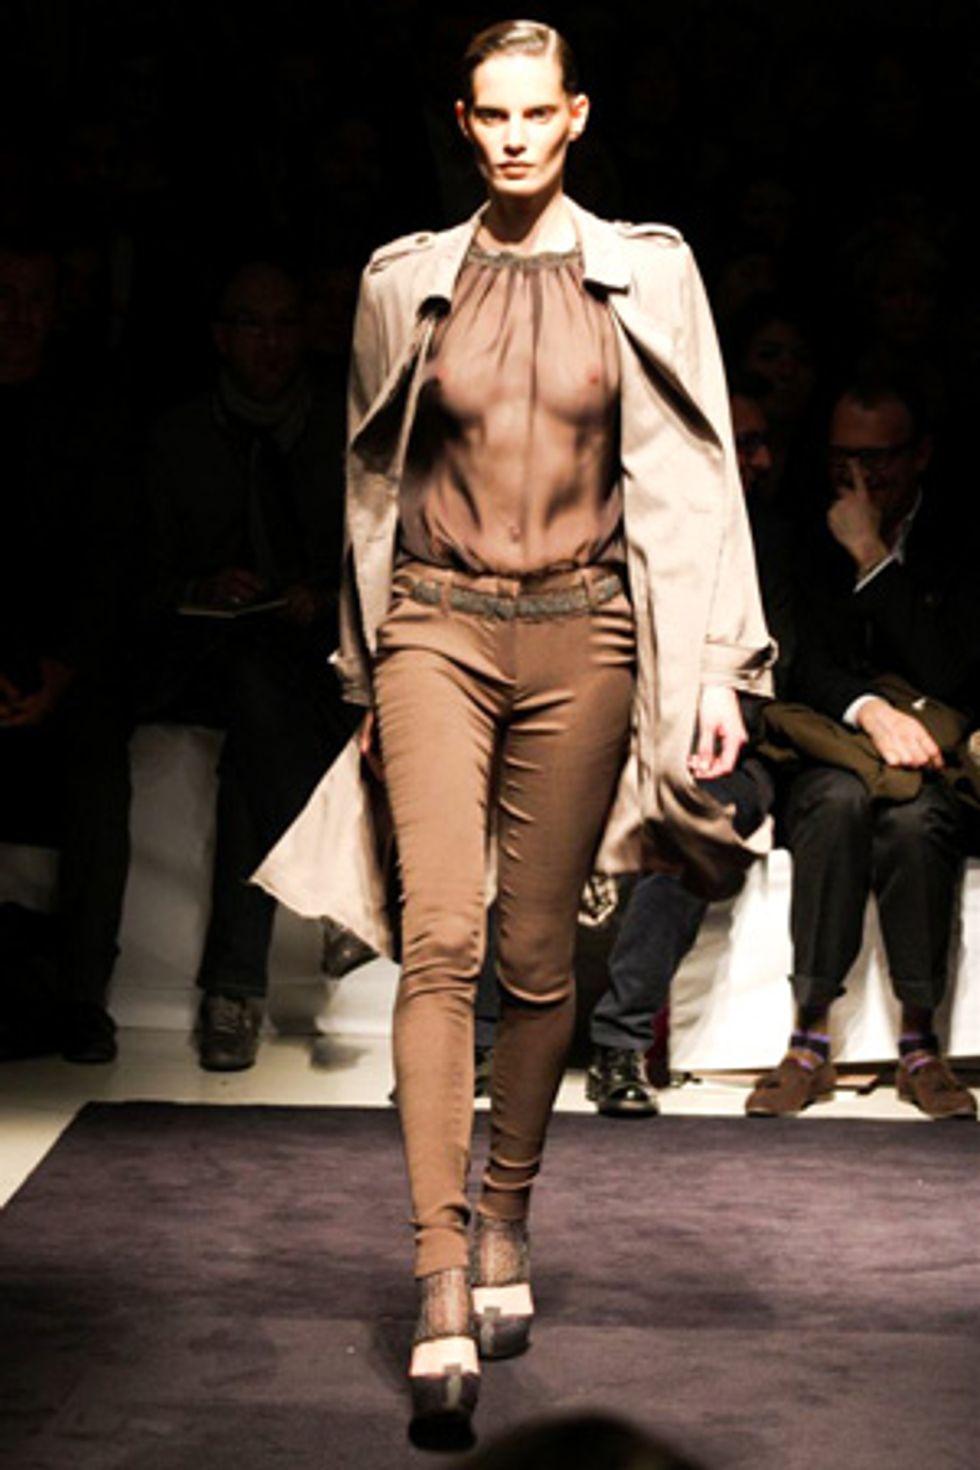 Milan Fashion Week Report: Alessandro Dell'Acqua